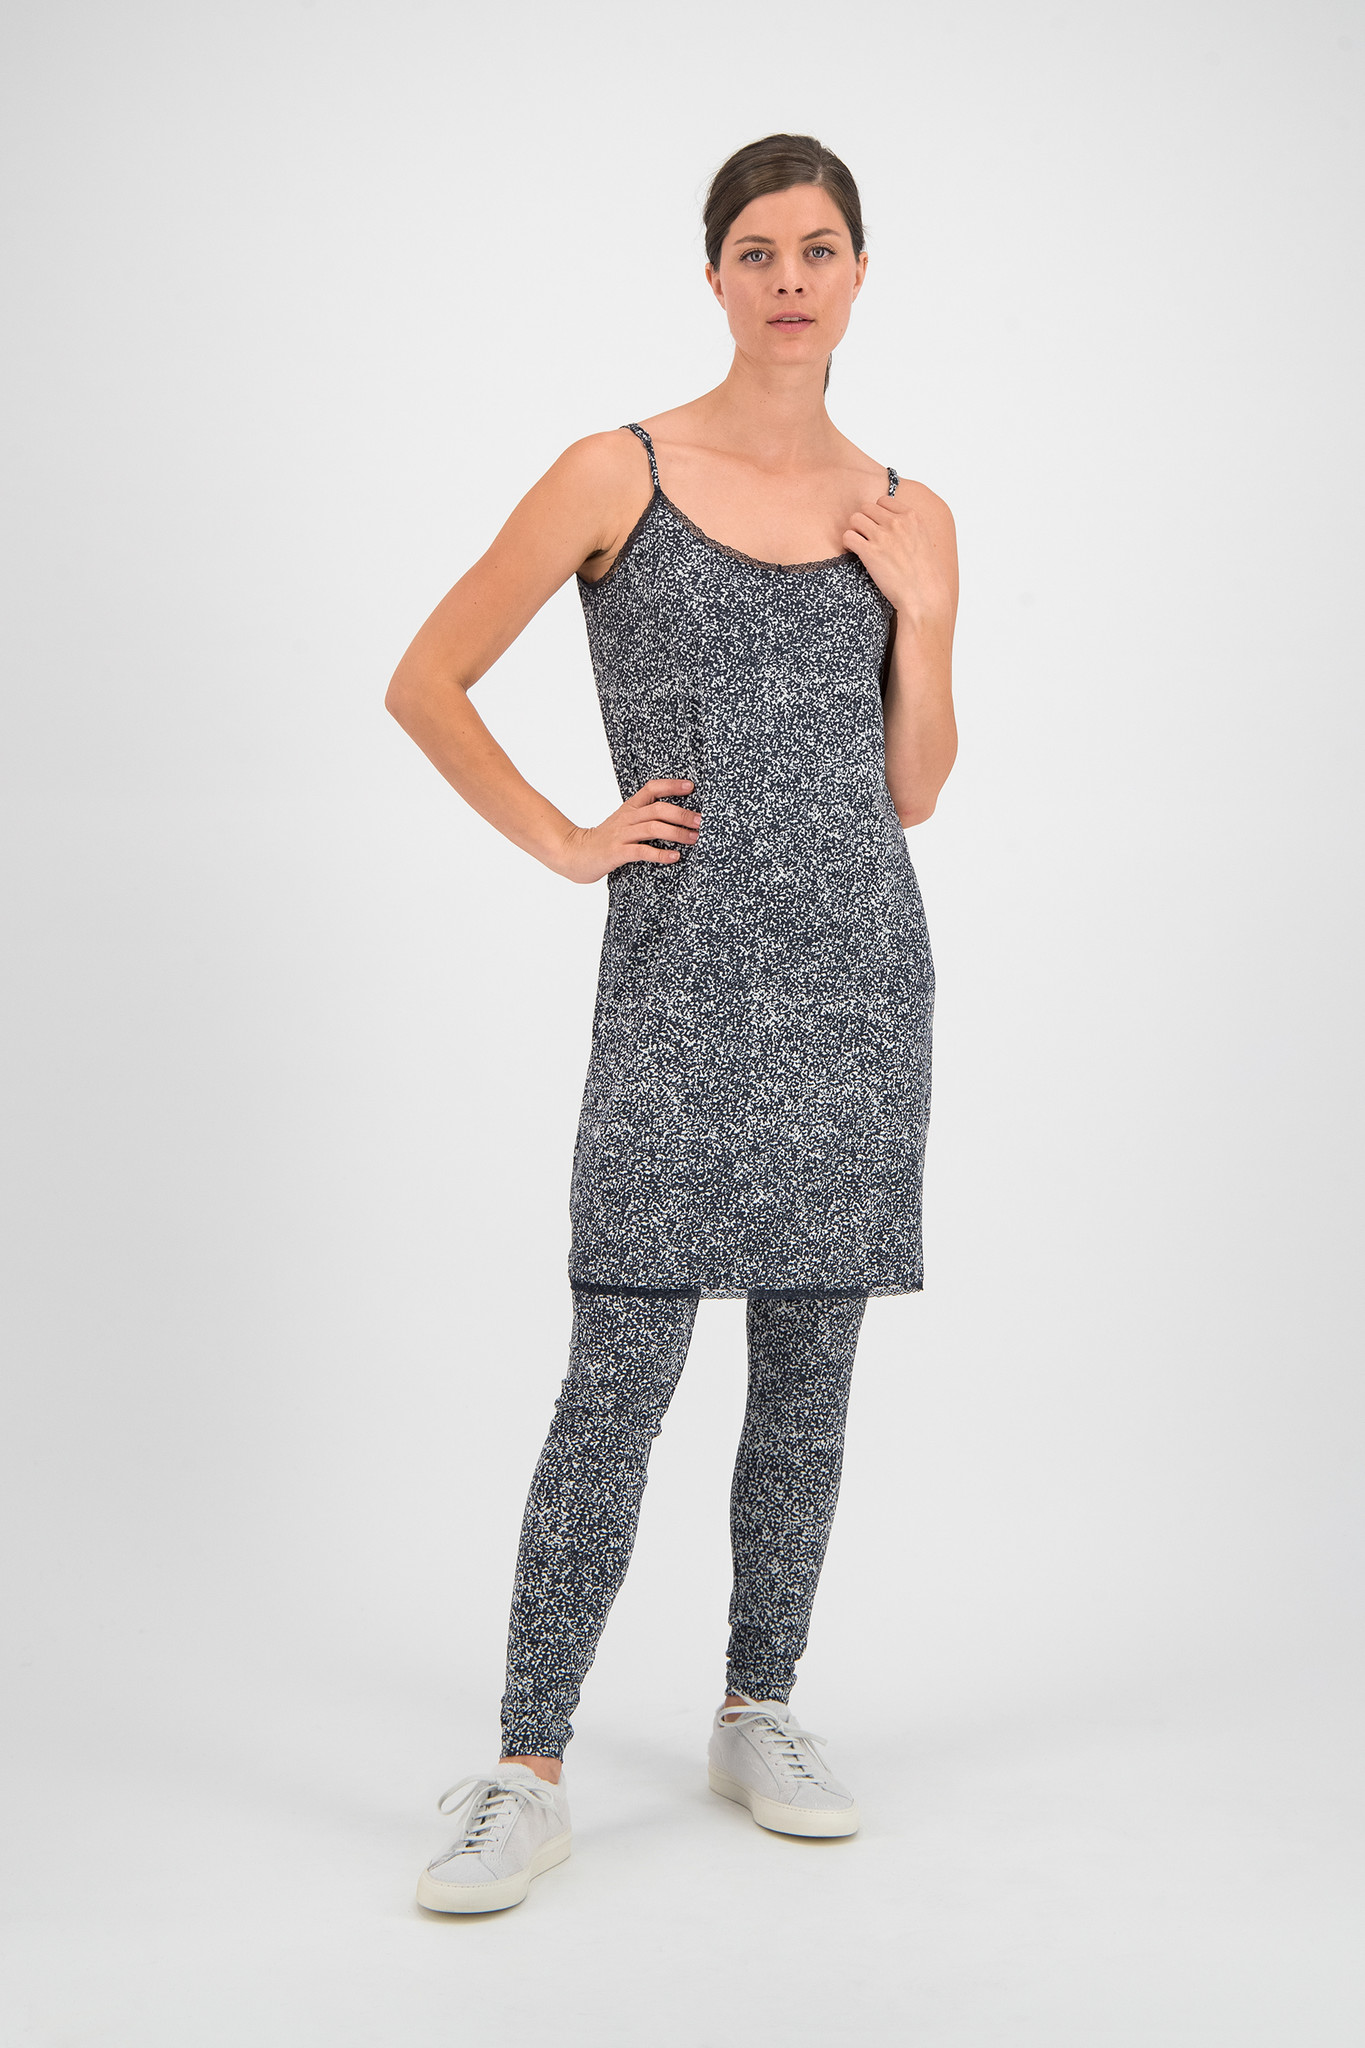 SYLVER Gravel Silky Jersey Pants - Grey